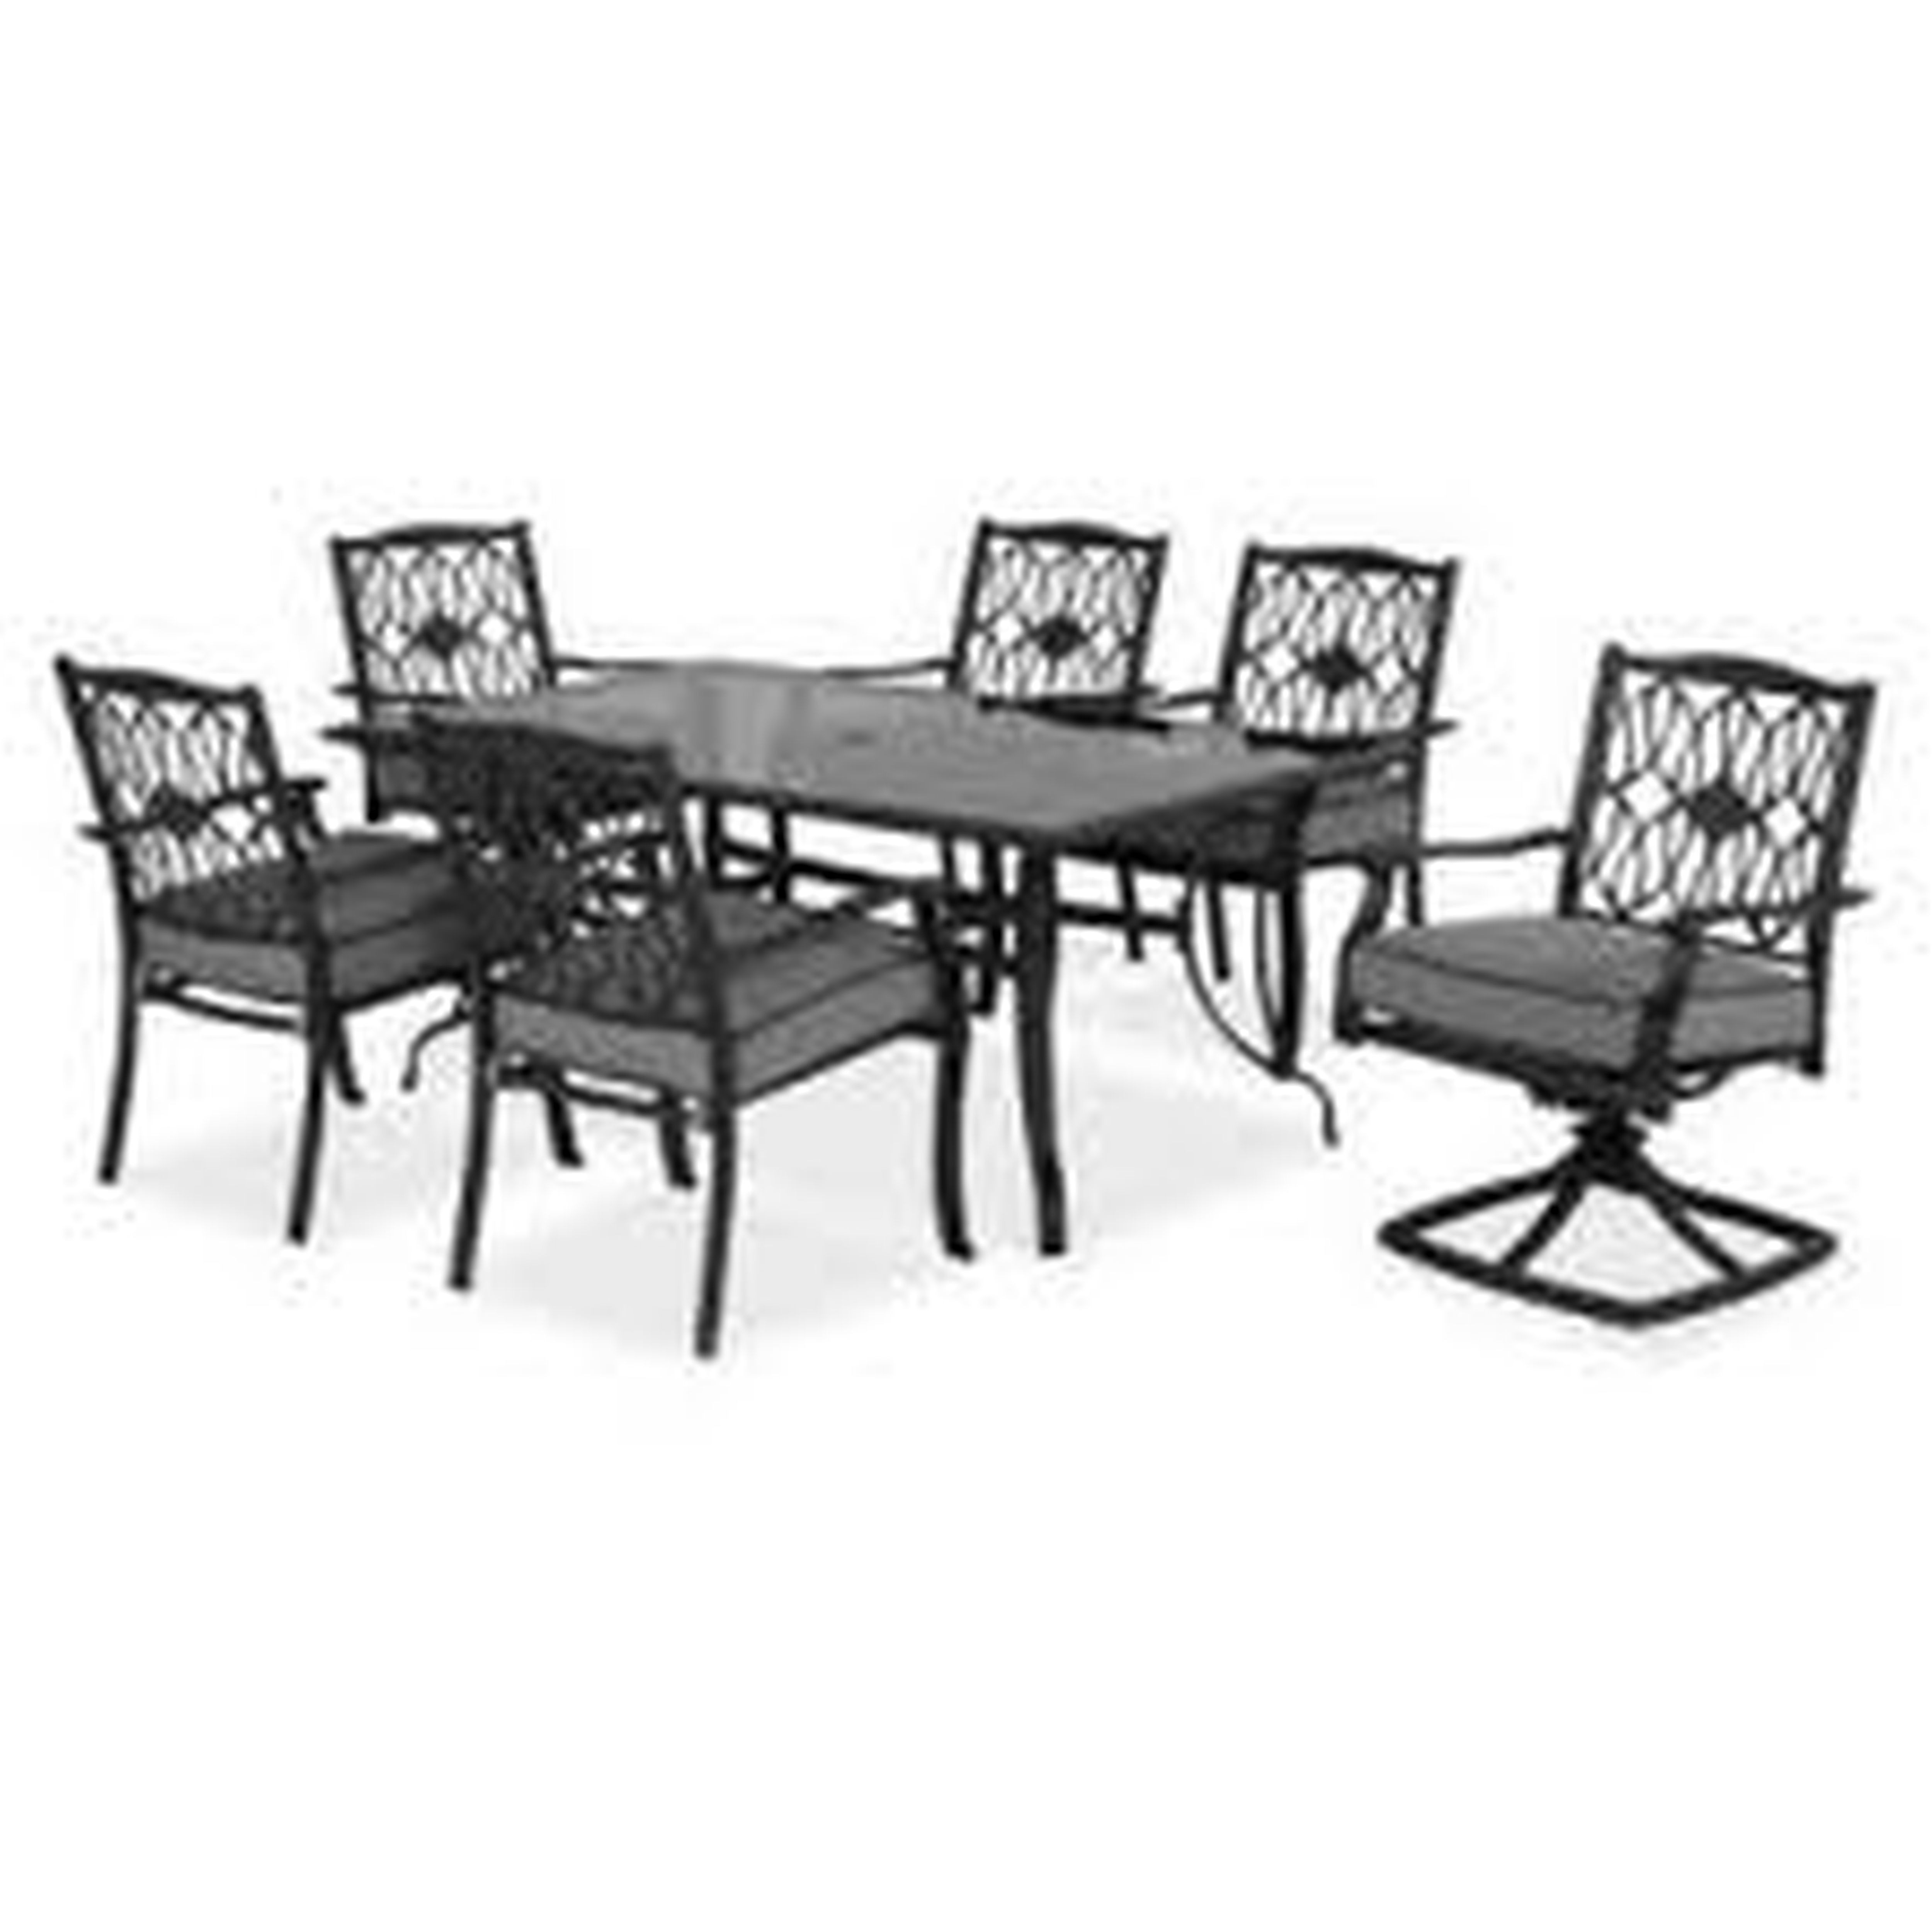 hampton bay patio set hampton bay patio chairs furniture astonishing concrete with dark LKSJNAL